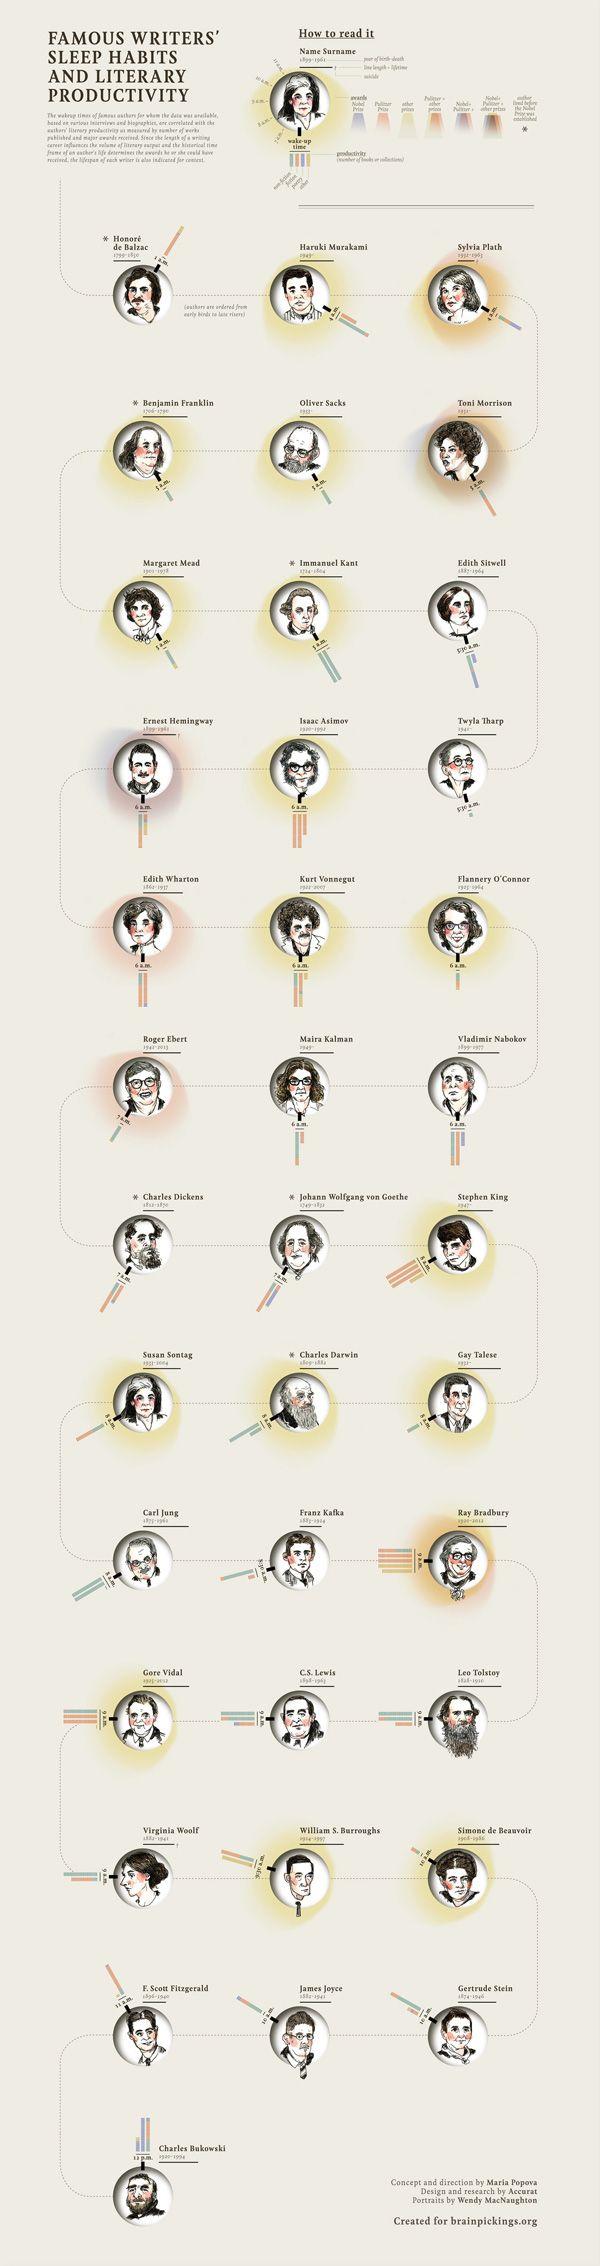 Interesting. Famous Writers' Sleep Habits vs. Literary Productivity, Visualized | Brain Pickings